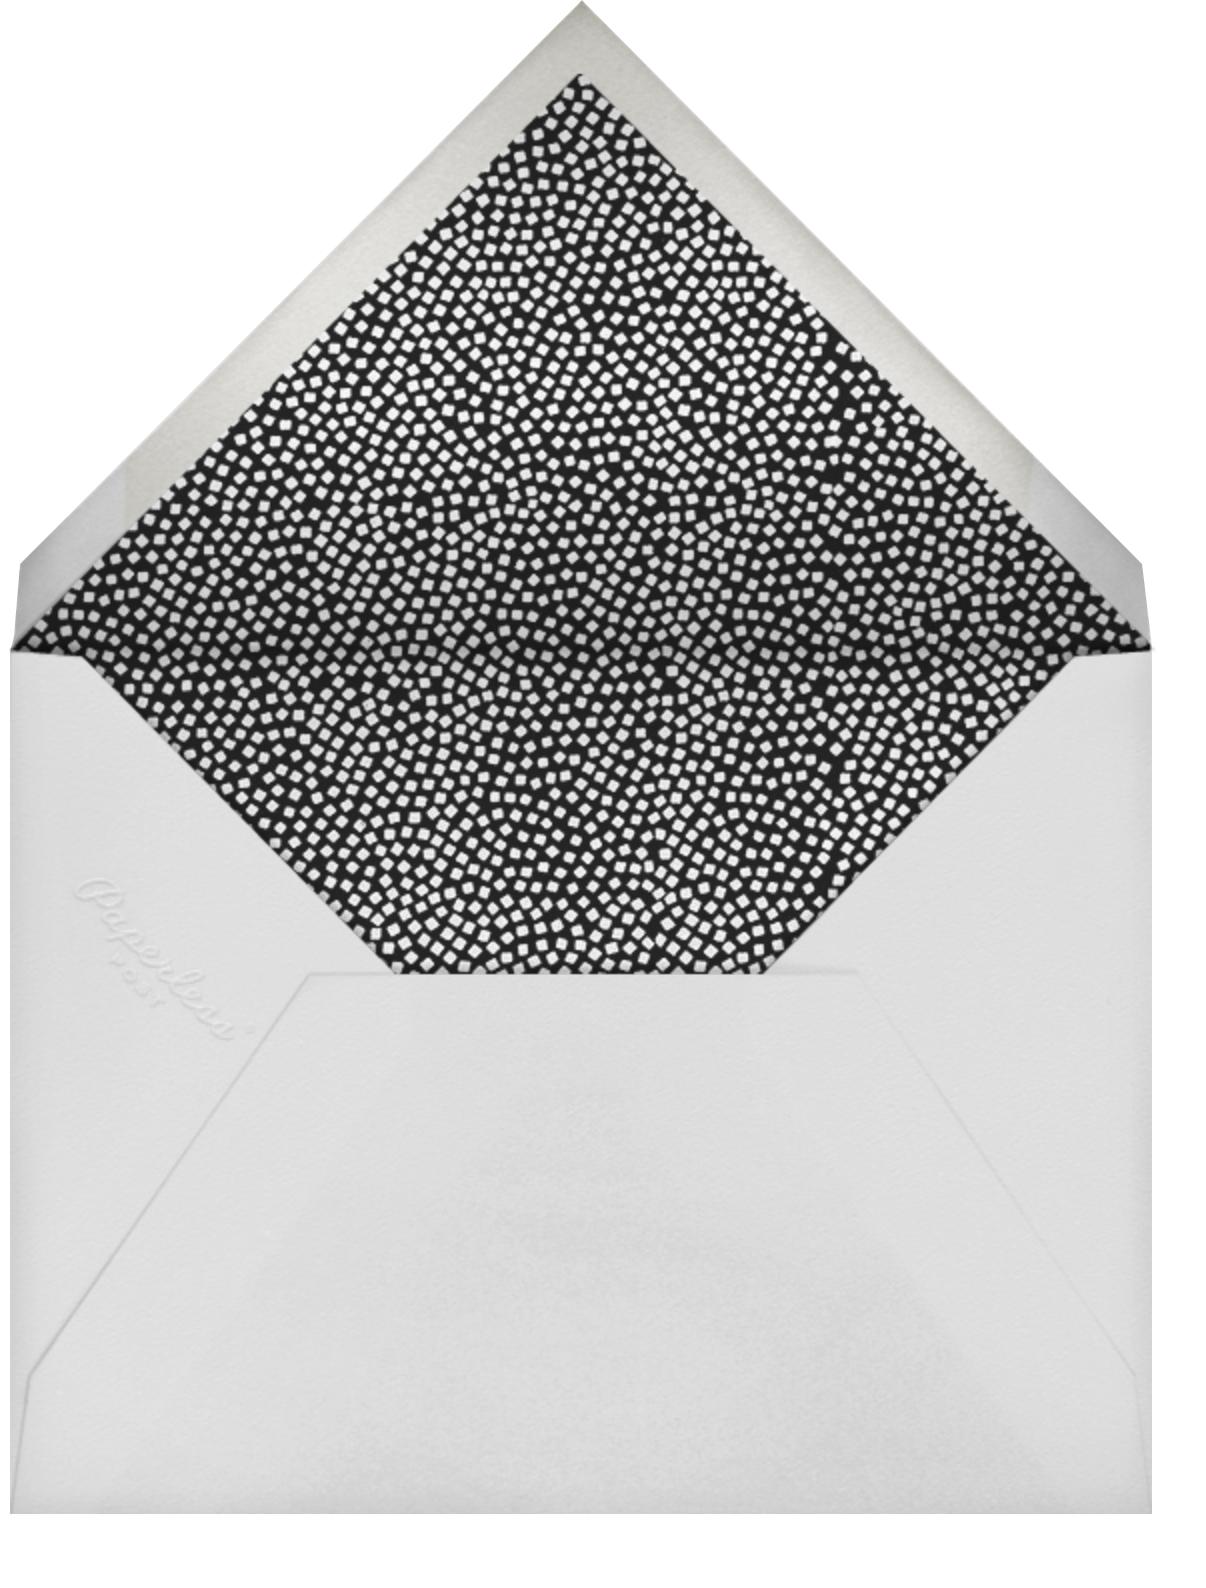 Kinetic Flow (Tall) - Kelly Wearstler - General entertaining - envelope back